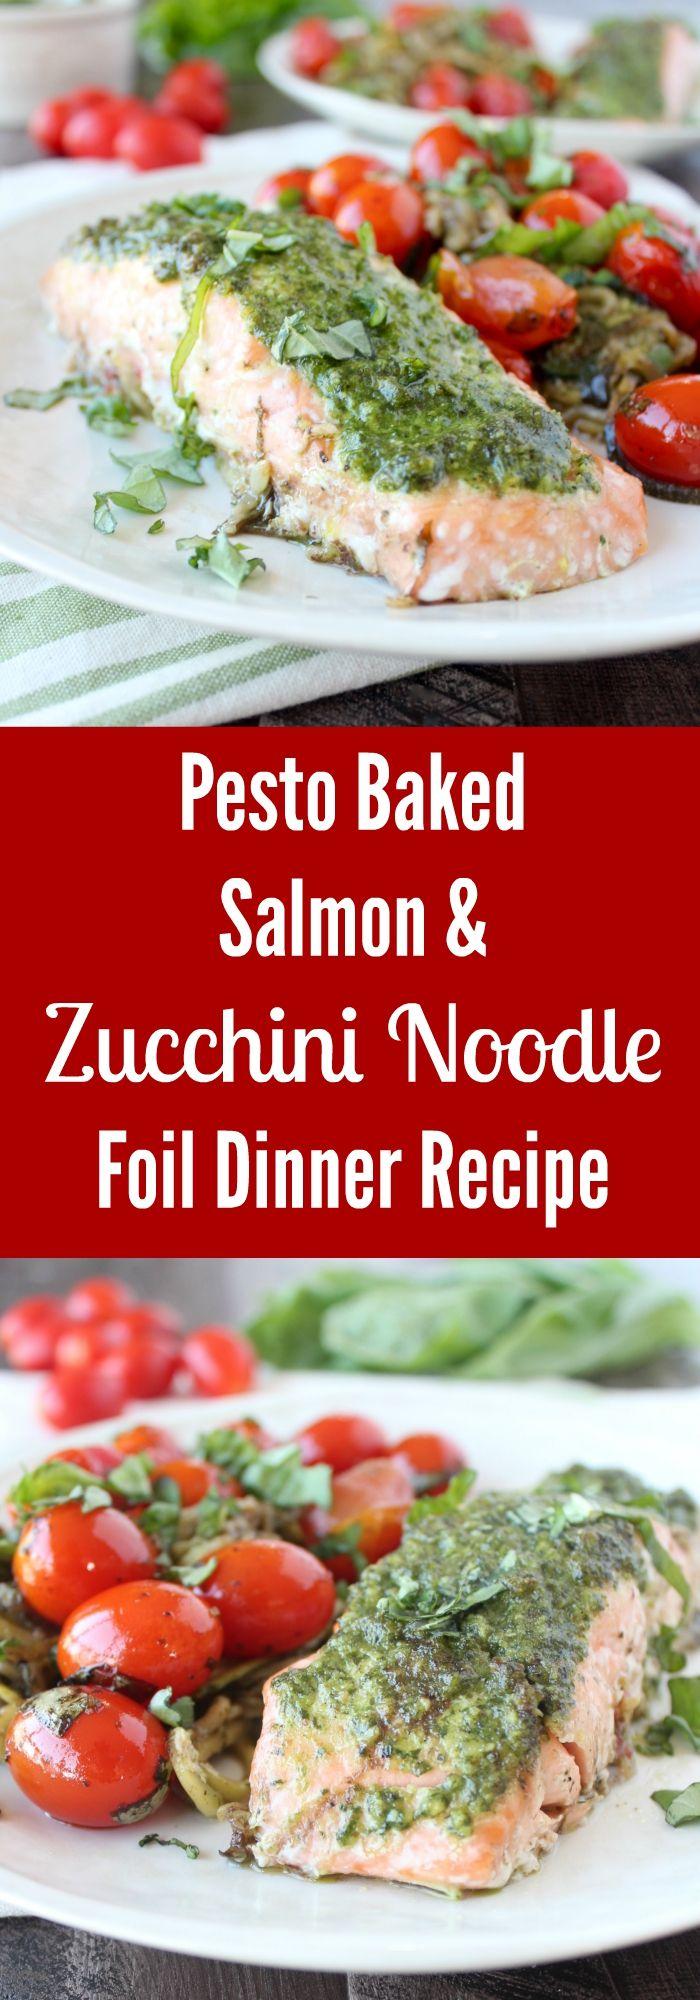 ... pesto baked salmon, zucchini noodles & balsamic basil cherry tomatoes